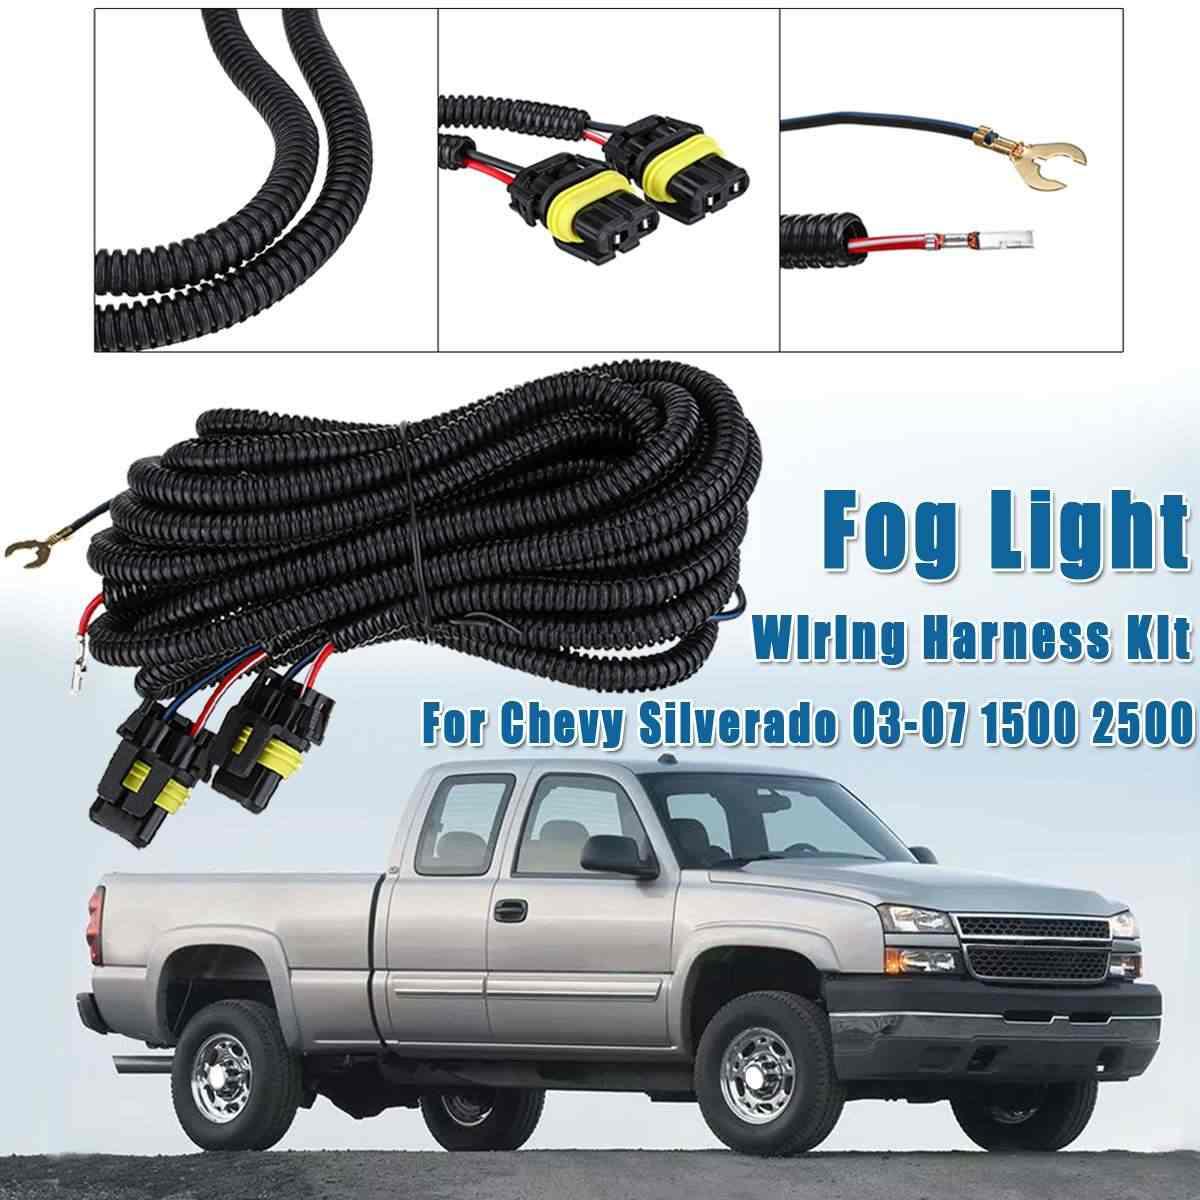 [SCHEMATICS_4CA]  Fog Light Wiring Harness Socket Wire Connect Kit For Chevy Silverado 1500  2500 2003 2004 2005 2006 2007 Car Light Assembly 1PCS| | - AliExpress | 2007 Chevy Silverado Wiring Harness |  | www.aliexpress.com